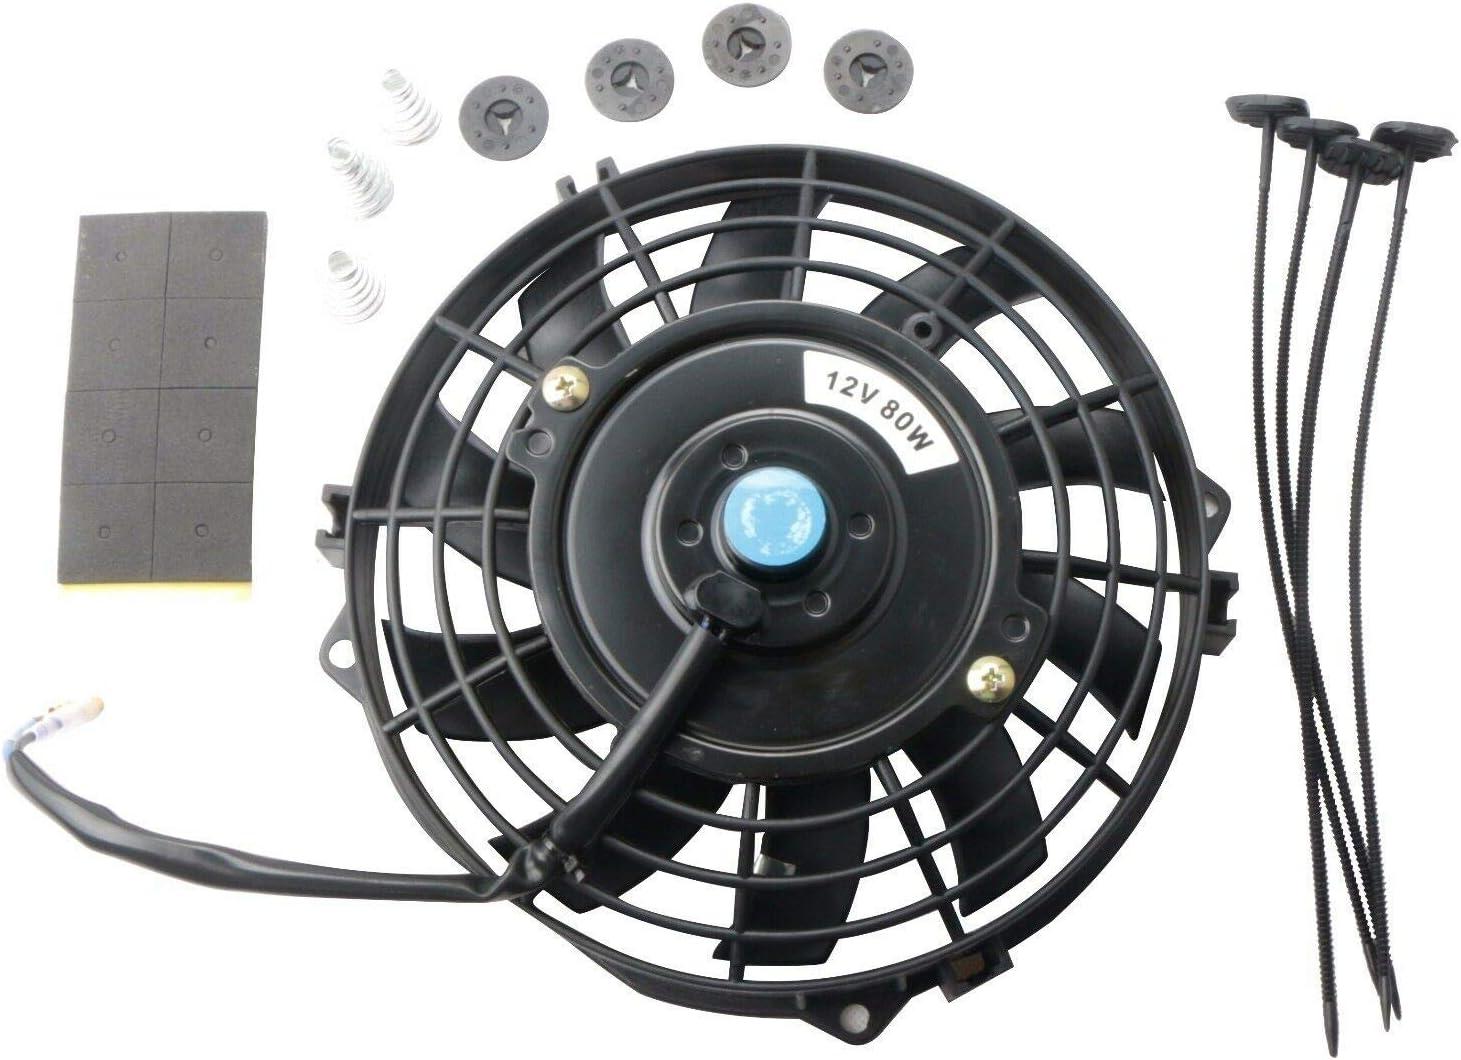 "LTI Universal High Performance S Blade Pull/Push 12V Slim Electric Cooling Radiator Fan + Fan Mounting Kit (7"", Black)"